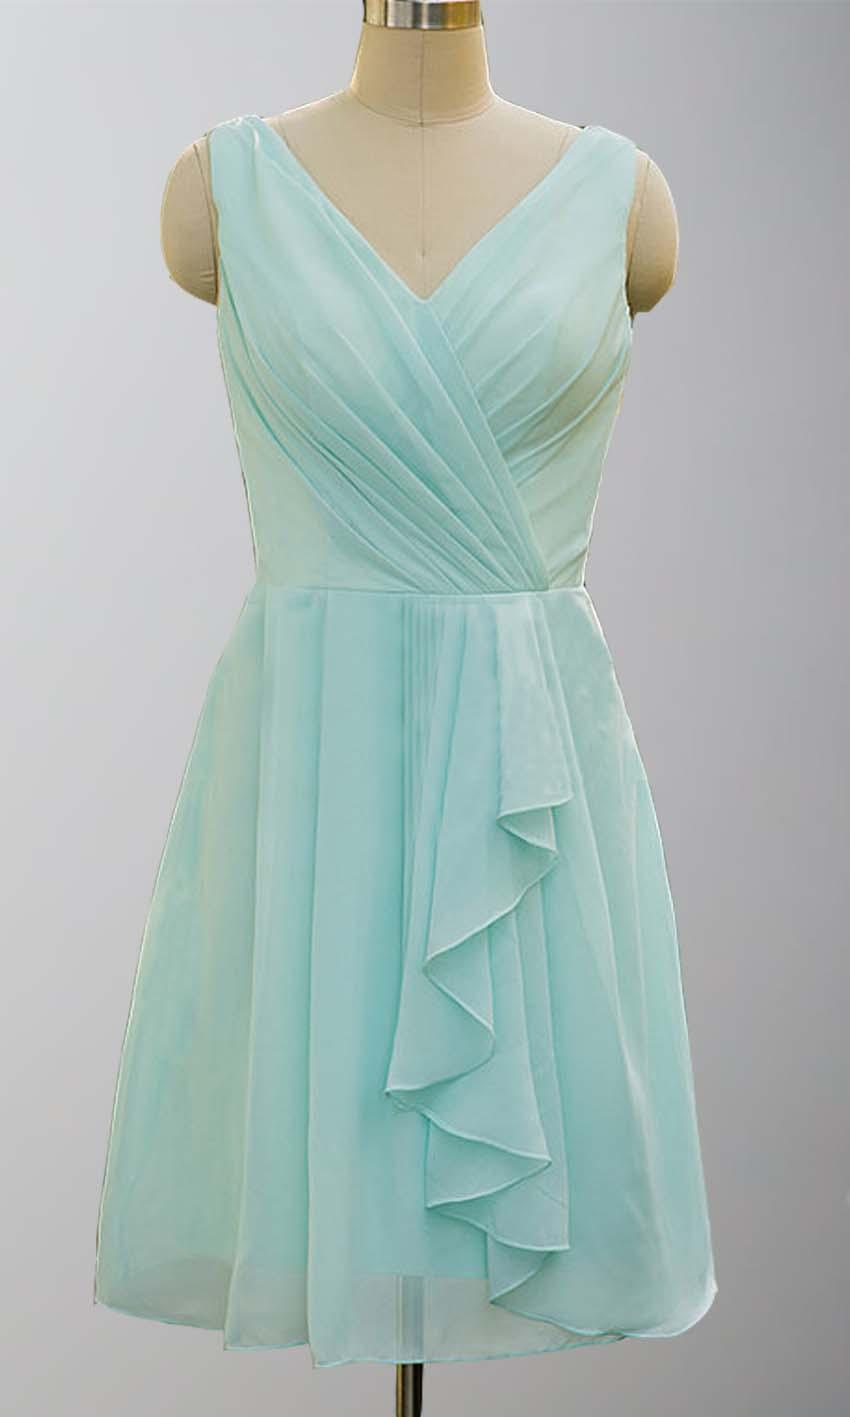 Wedding - Pretty Mint V-neck Ruffled Short Bridesmaid Dresses KSP138